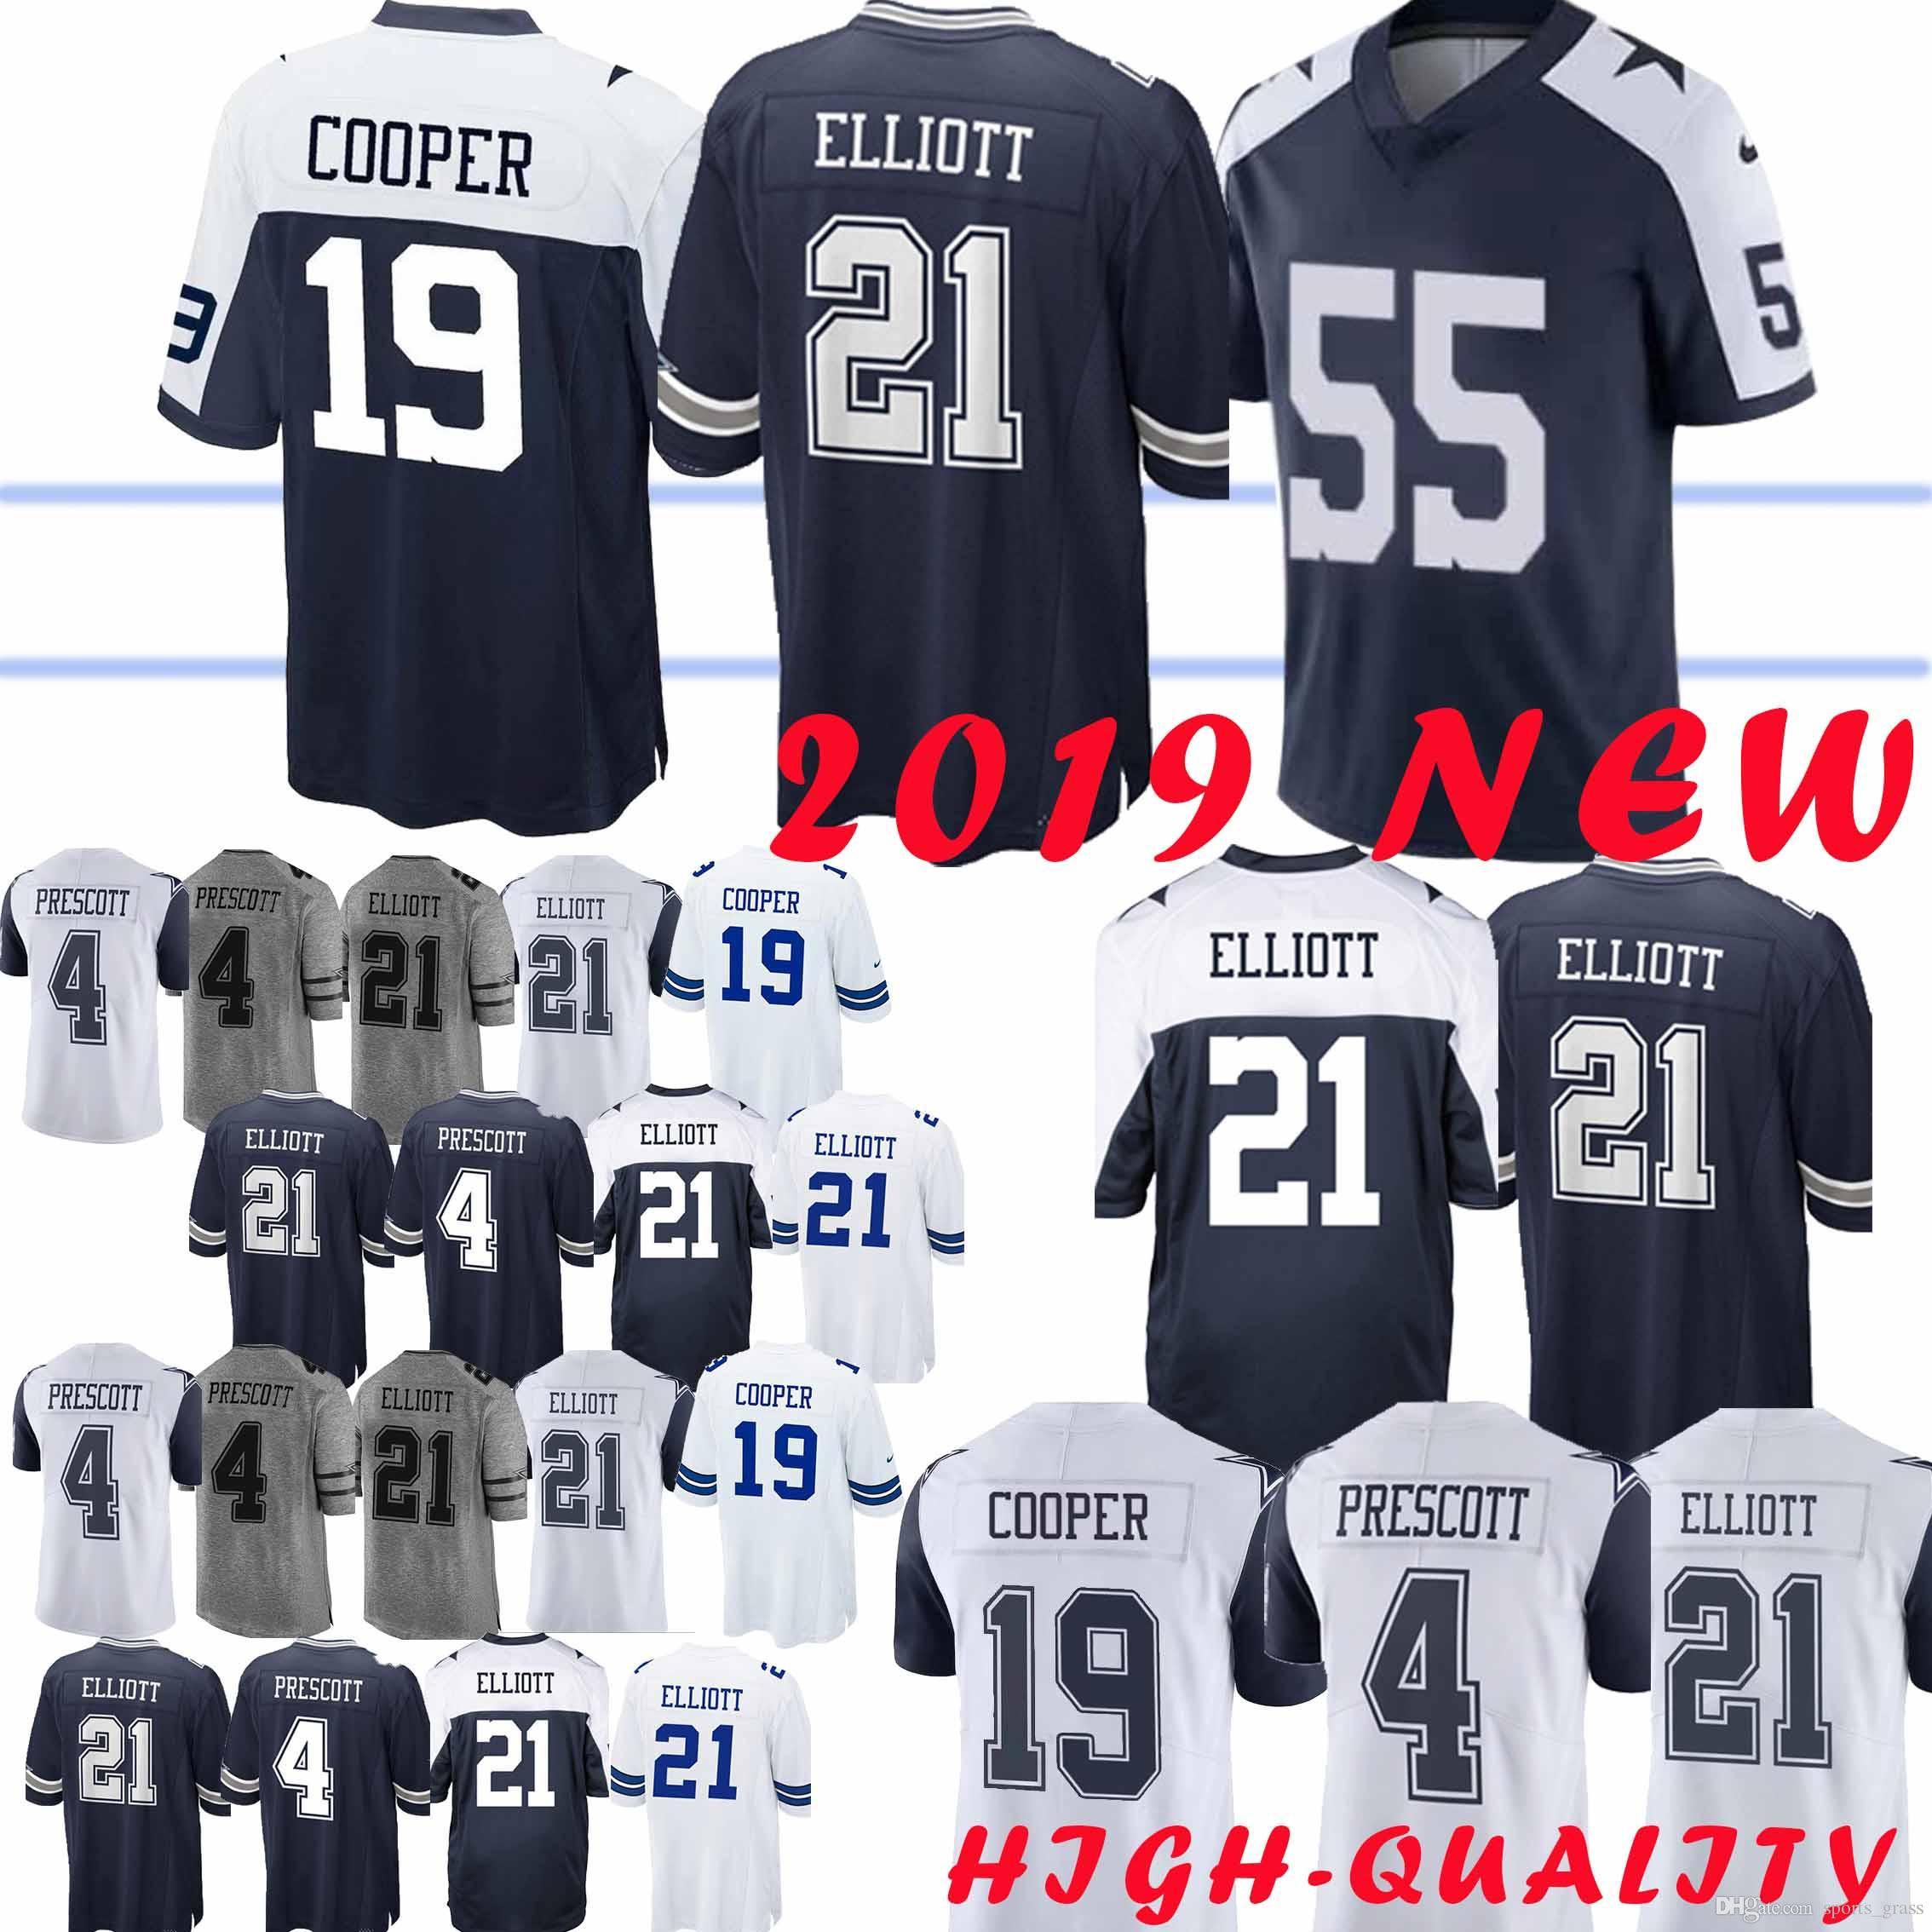 newest 72247 3f572 21 Ezekiel Elliott Dallas 55 Leighton Vander Esch jersey 4 Dak Prescott  Cowboys 19 Amari Cooper 82 Jason Witte jerseys High-quality 2019 new